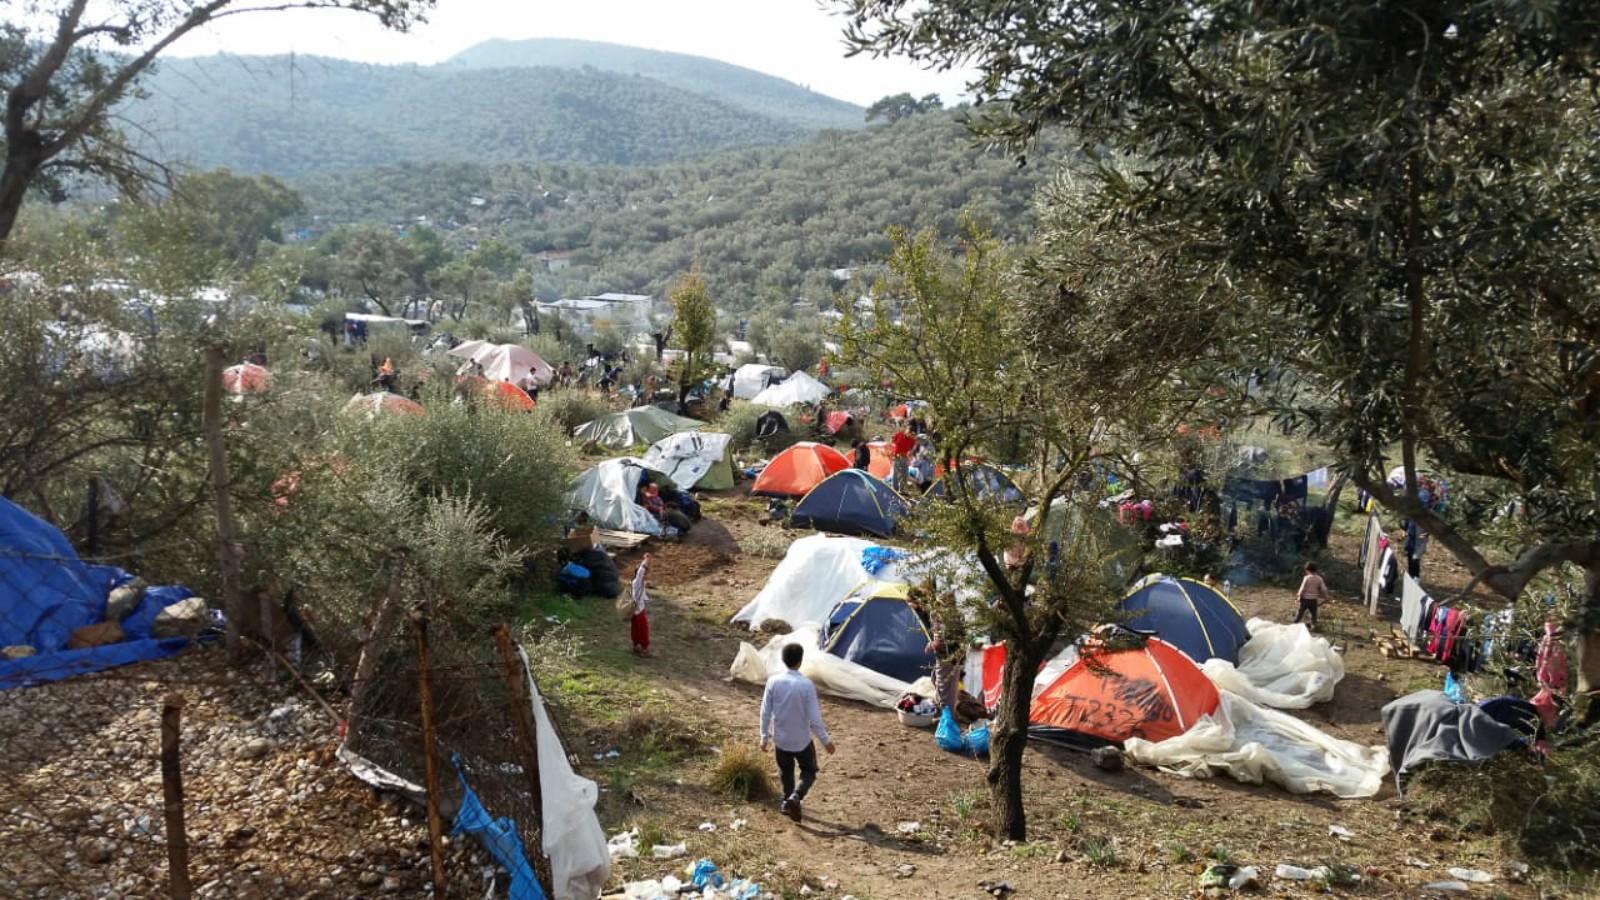 Israeli NGO mourns destruction of refugee camp they helped build - ISRAEL21c